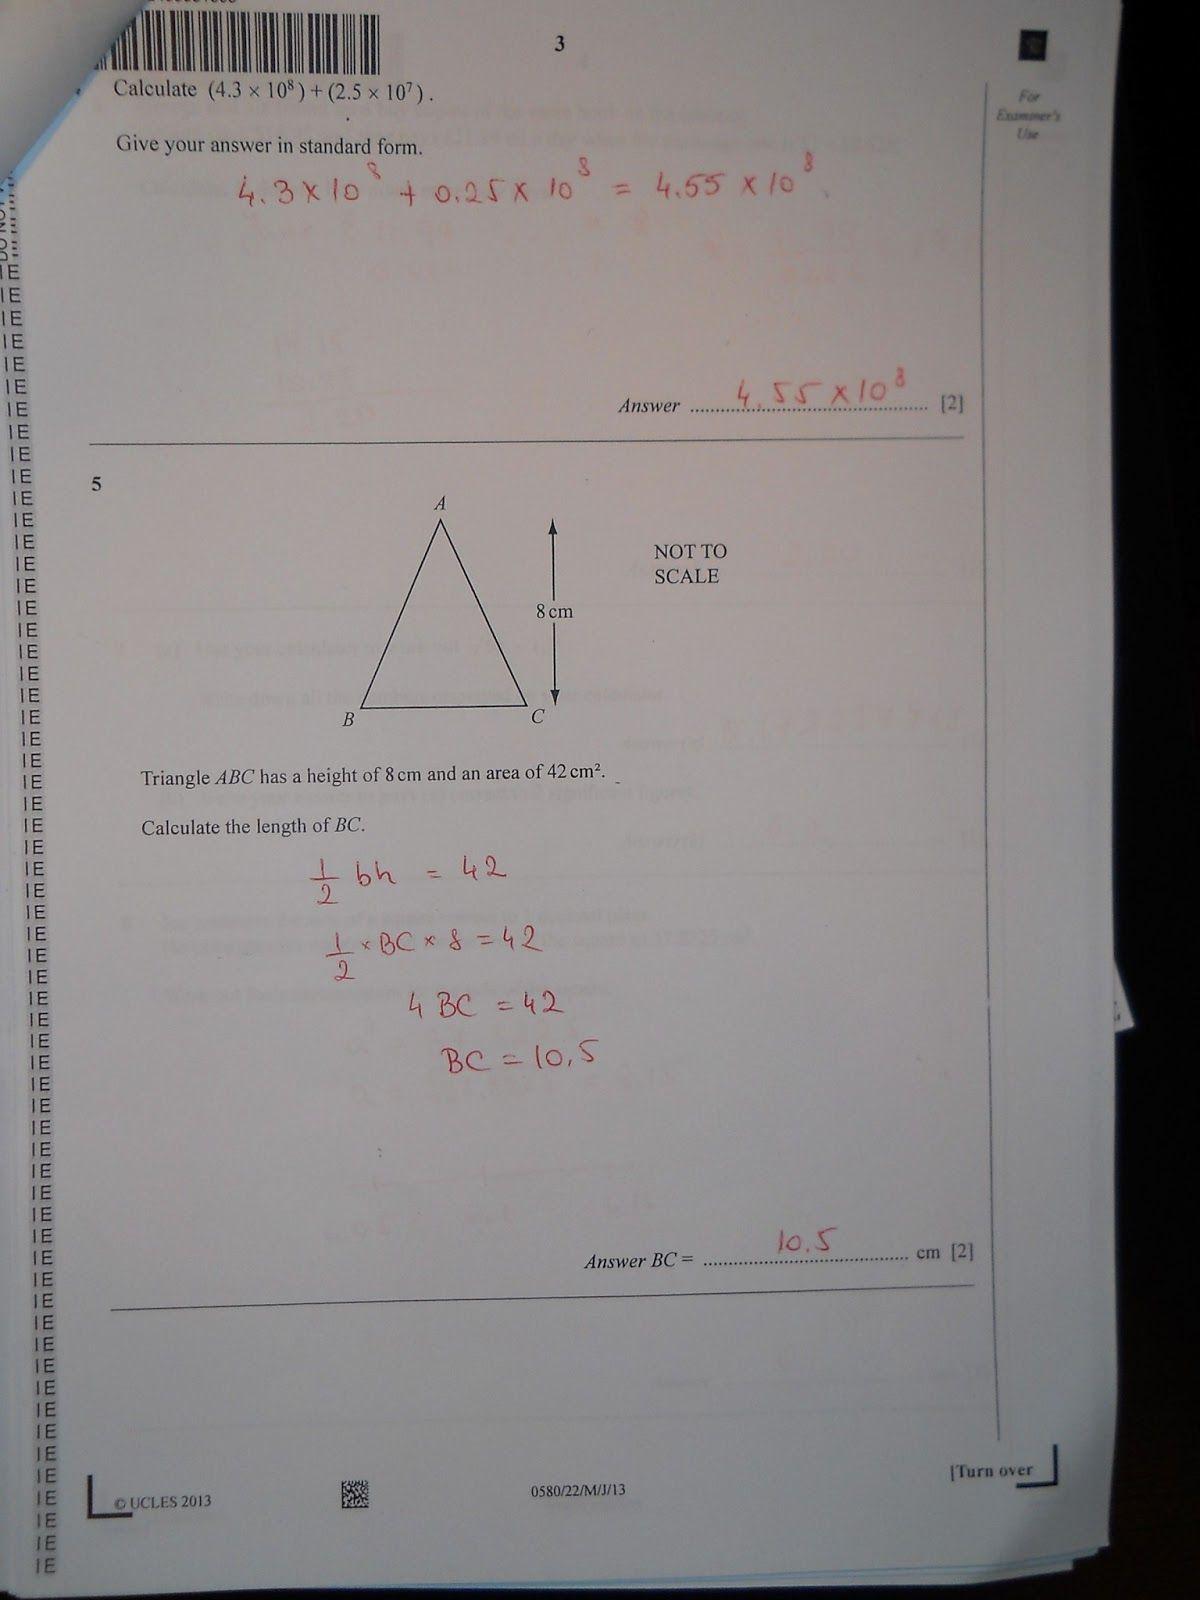 Edexcel igcse mathematics b past papers  Edexcel IGCSE